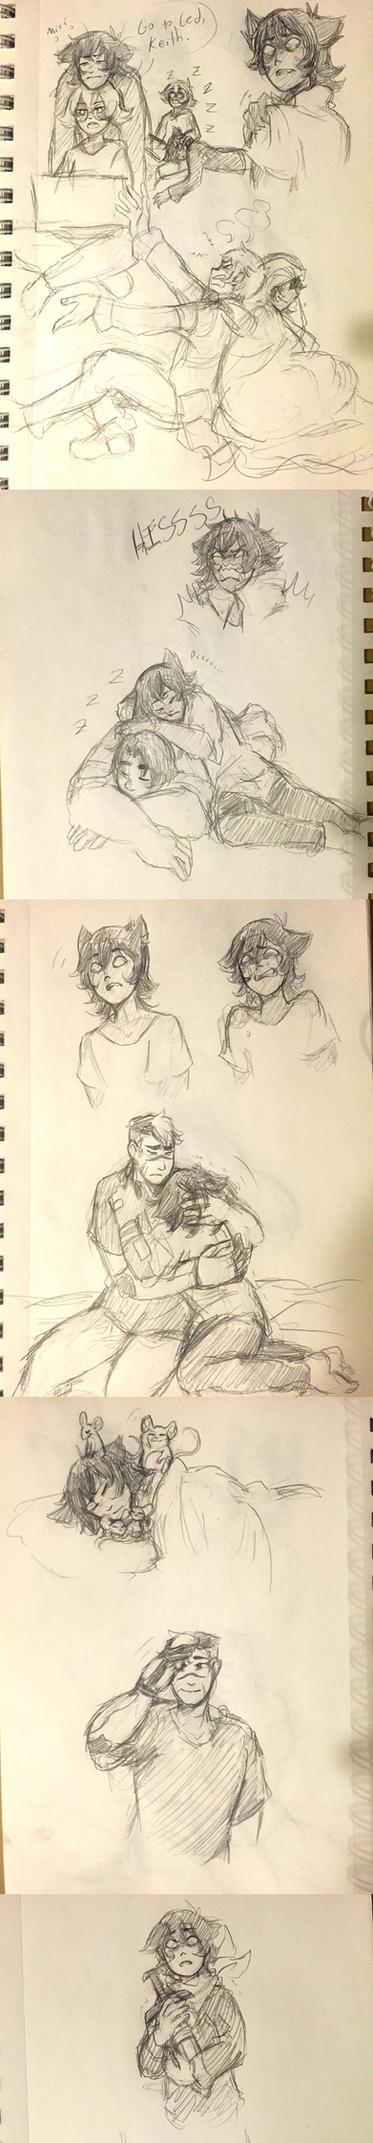 Galra!Keith Doodles by Medli45